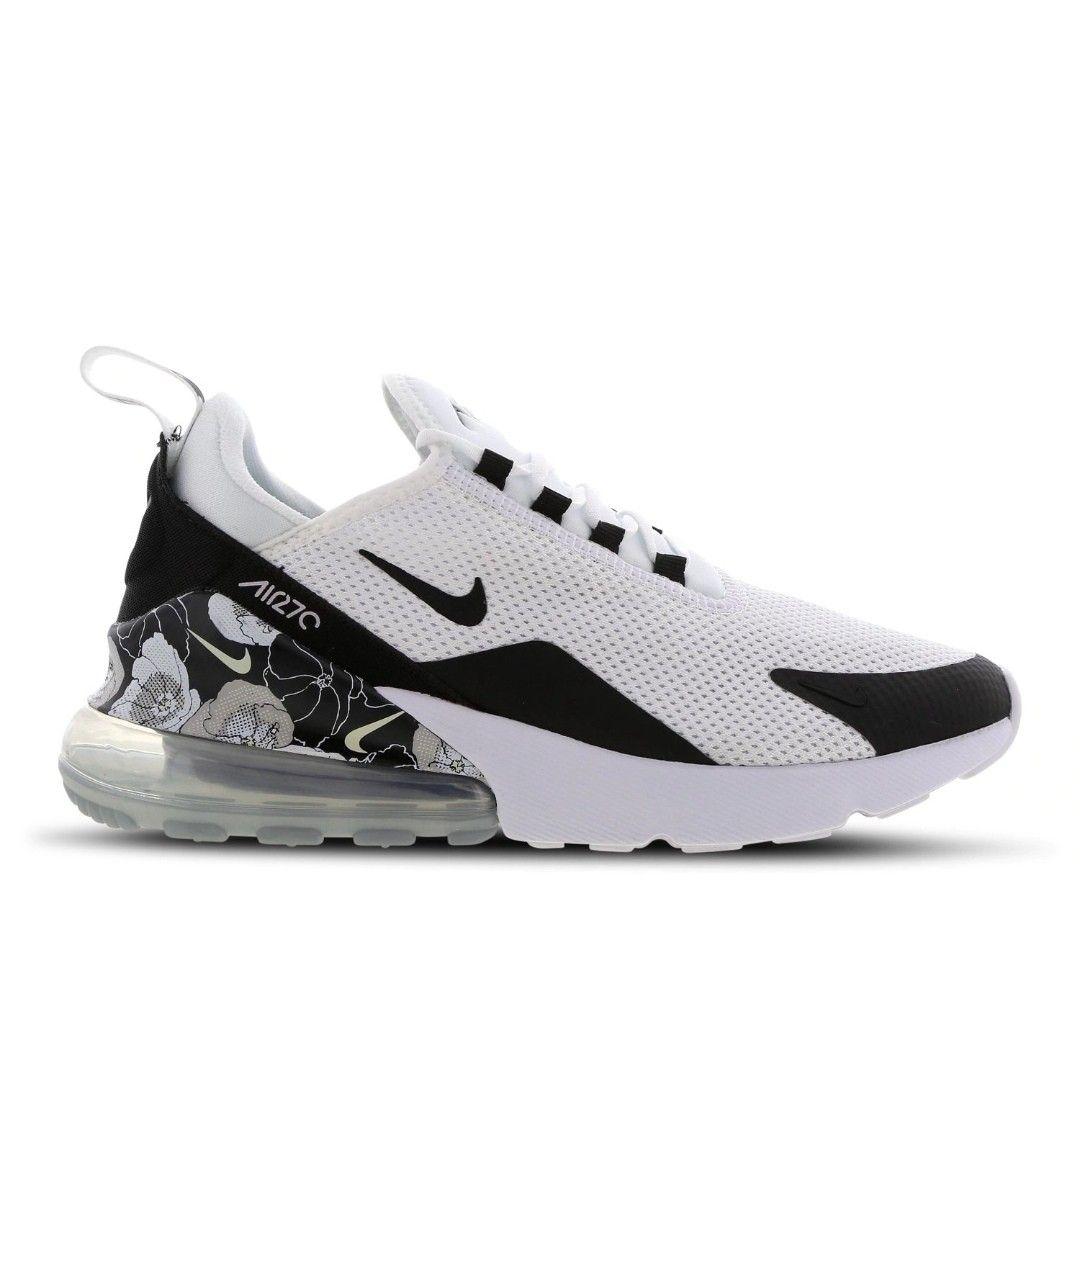 Available at foot locker whiteblacktrainersfootwear